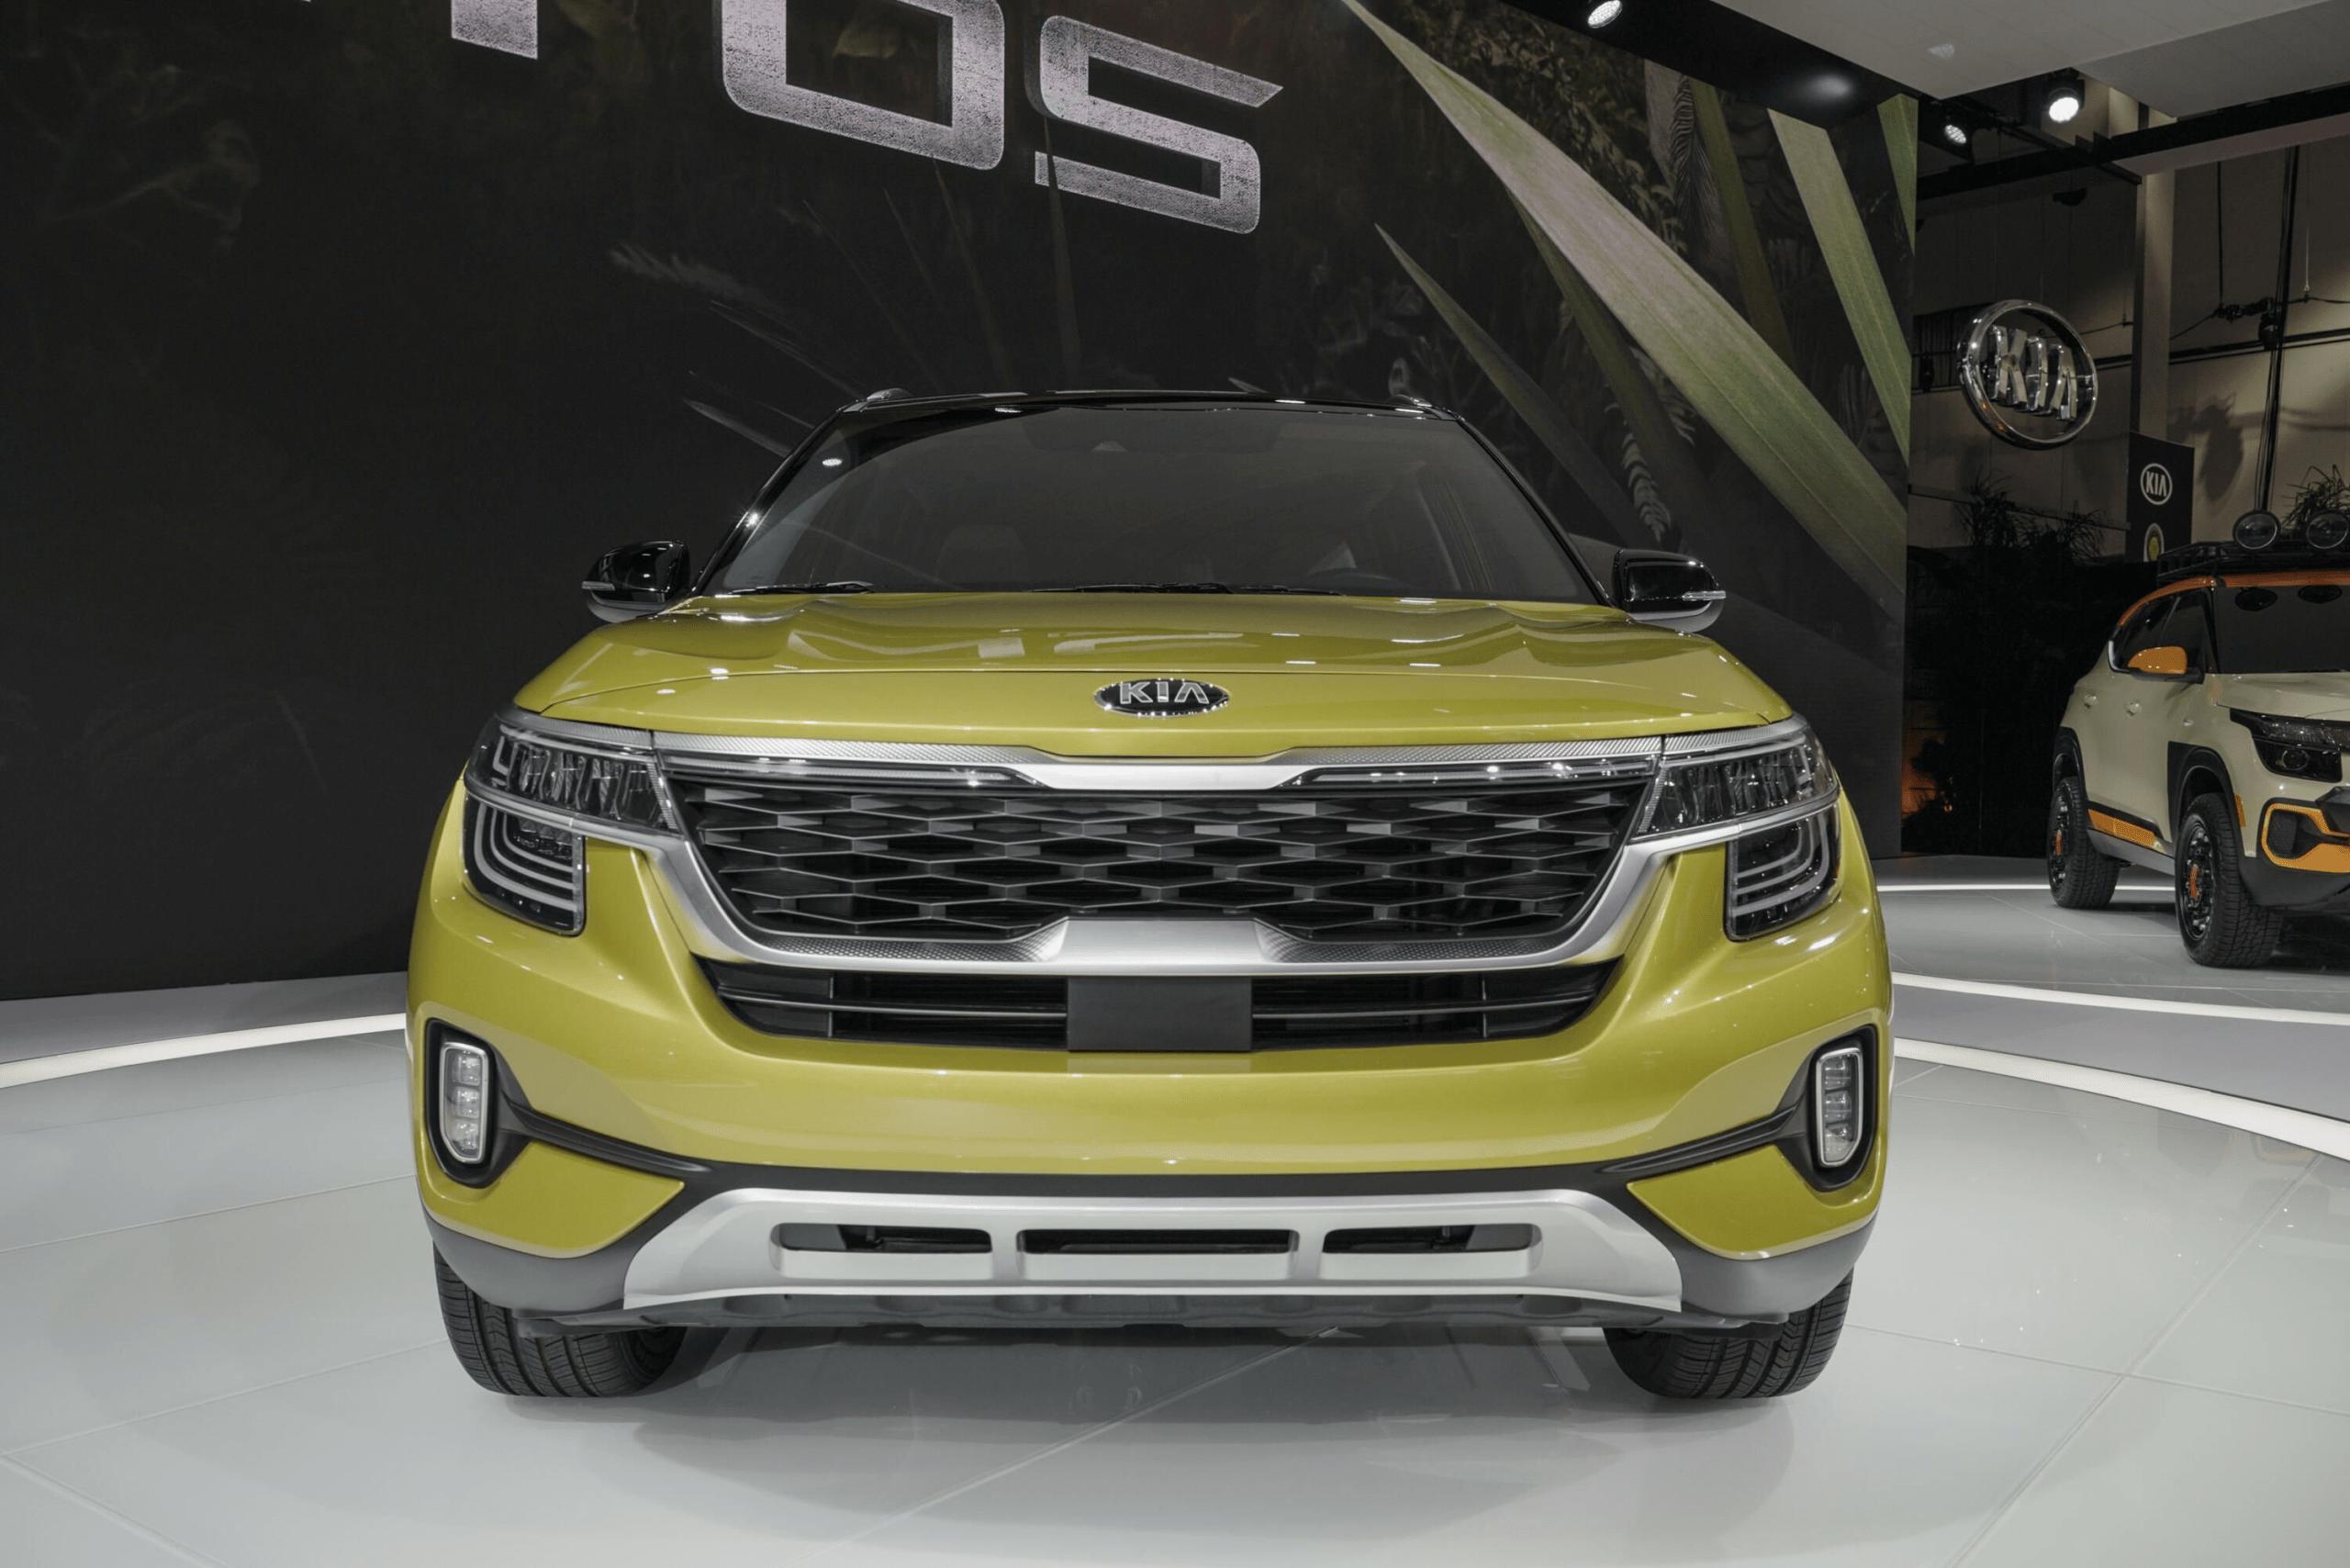 2021 Hyundai Equus Pricing in 2020   Kia, Hyundai, Model